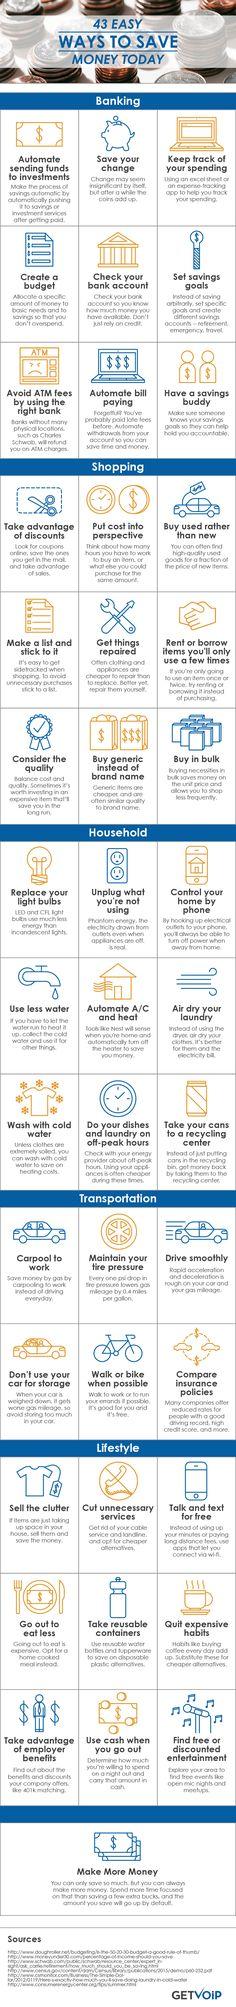 43 Easy Ways to Save Money Today